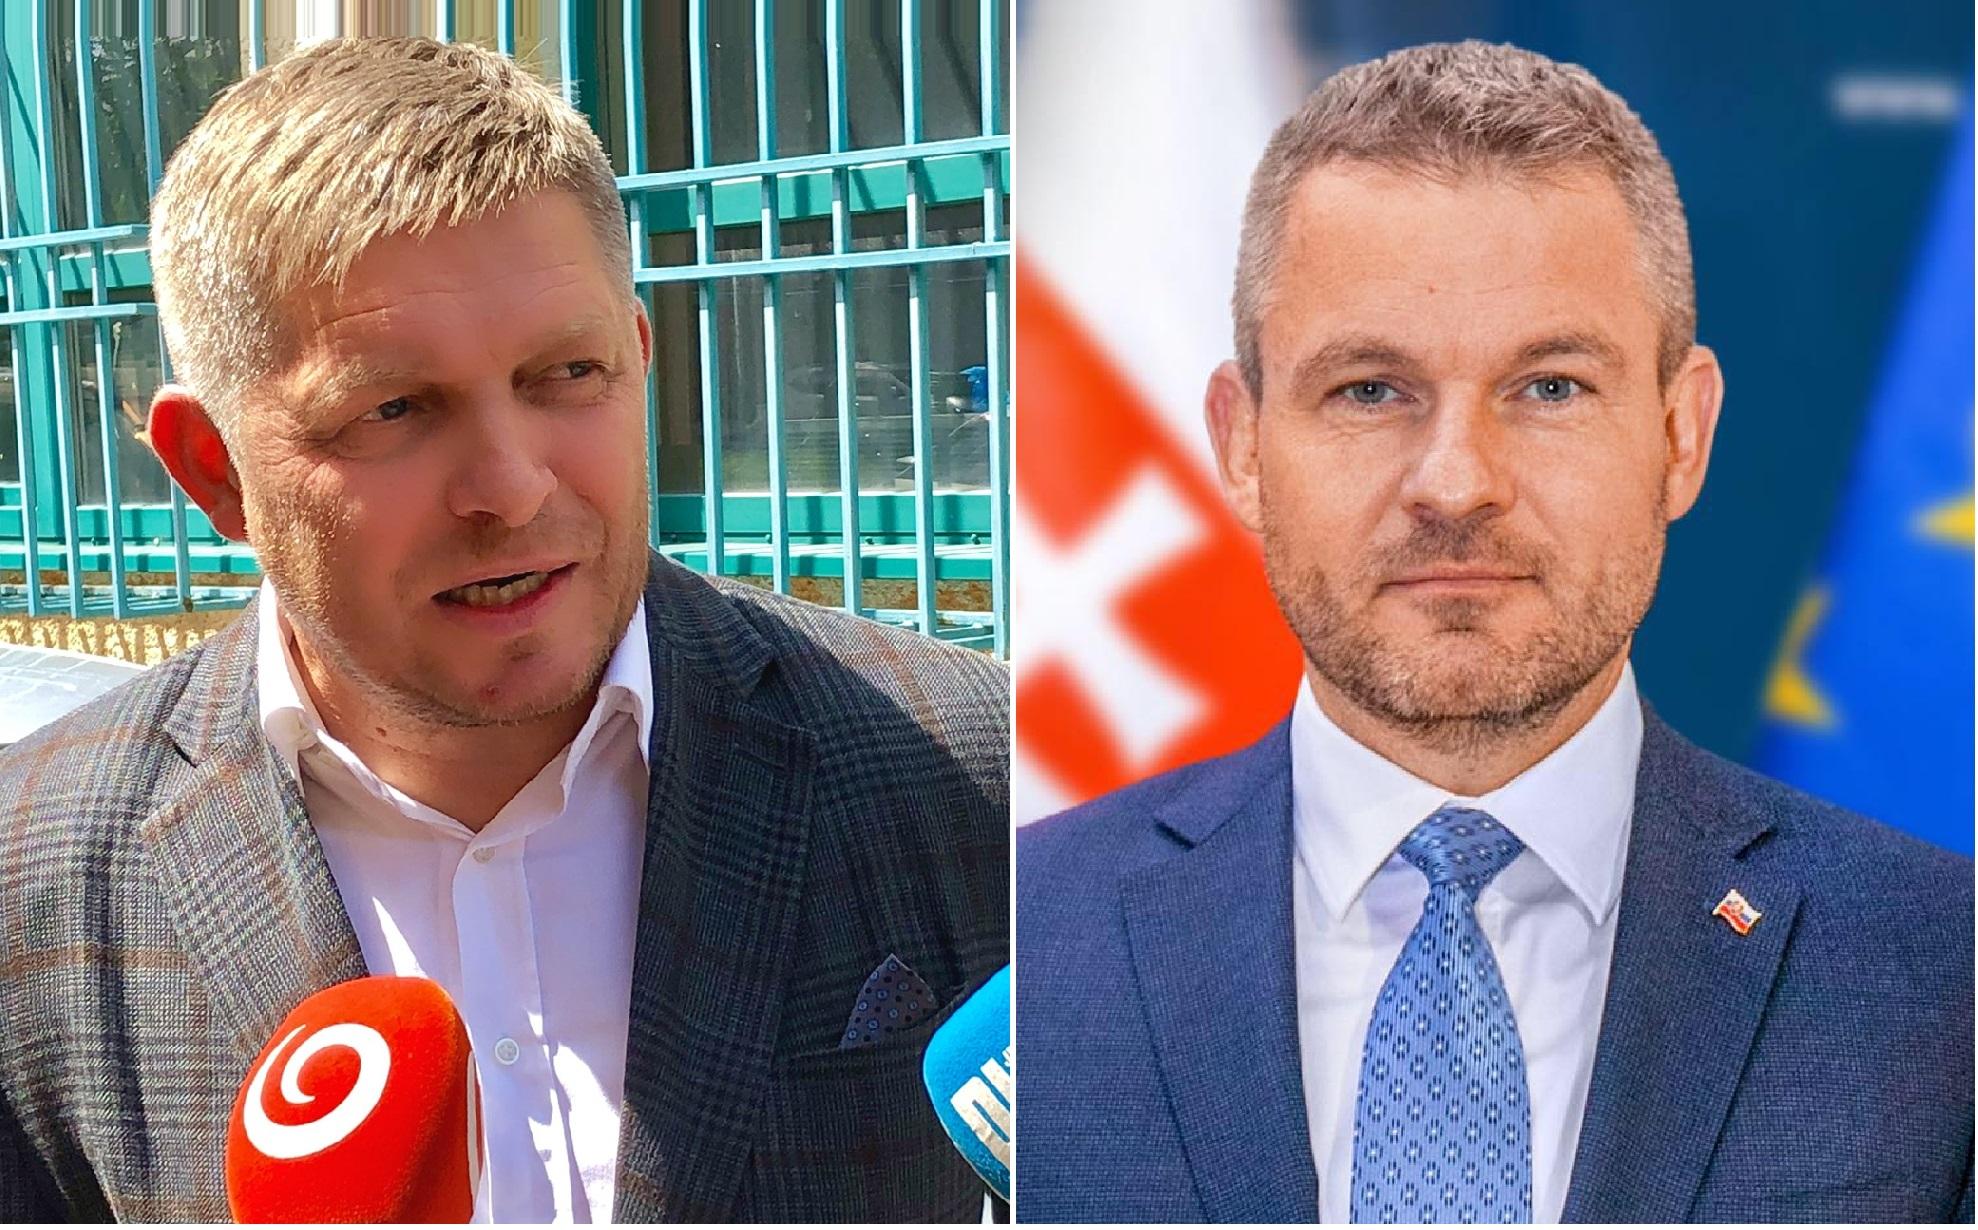 Robert Fico, Peter Pellegrinii, Smer-SD